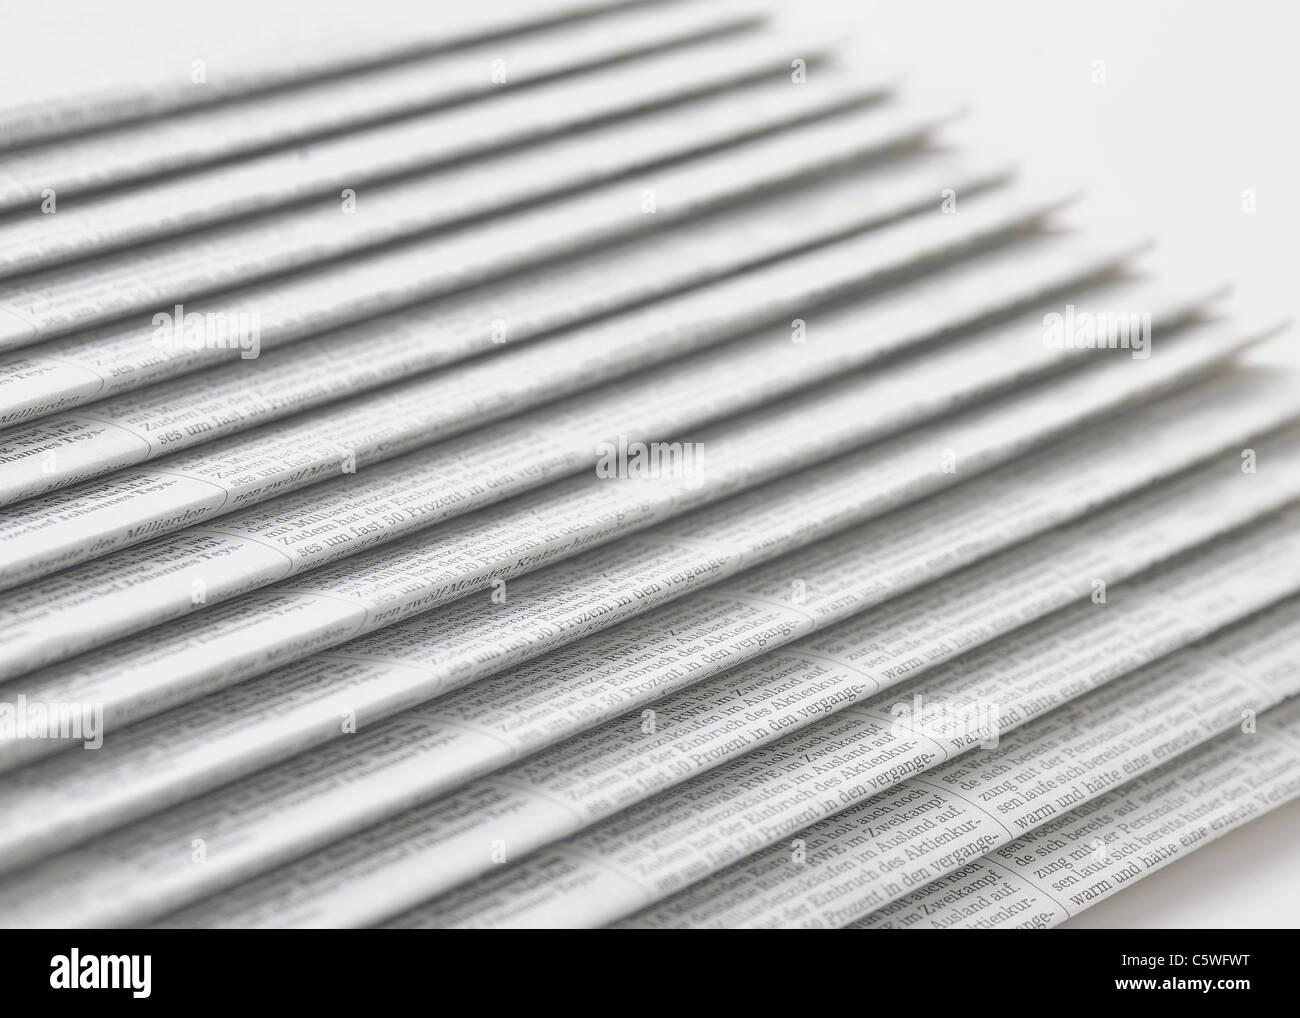 Fila de periódicos sobre fondo blanco. Imagen De Stock